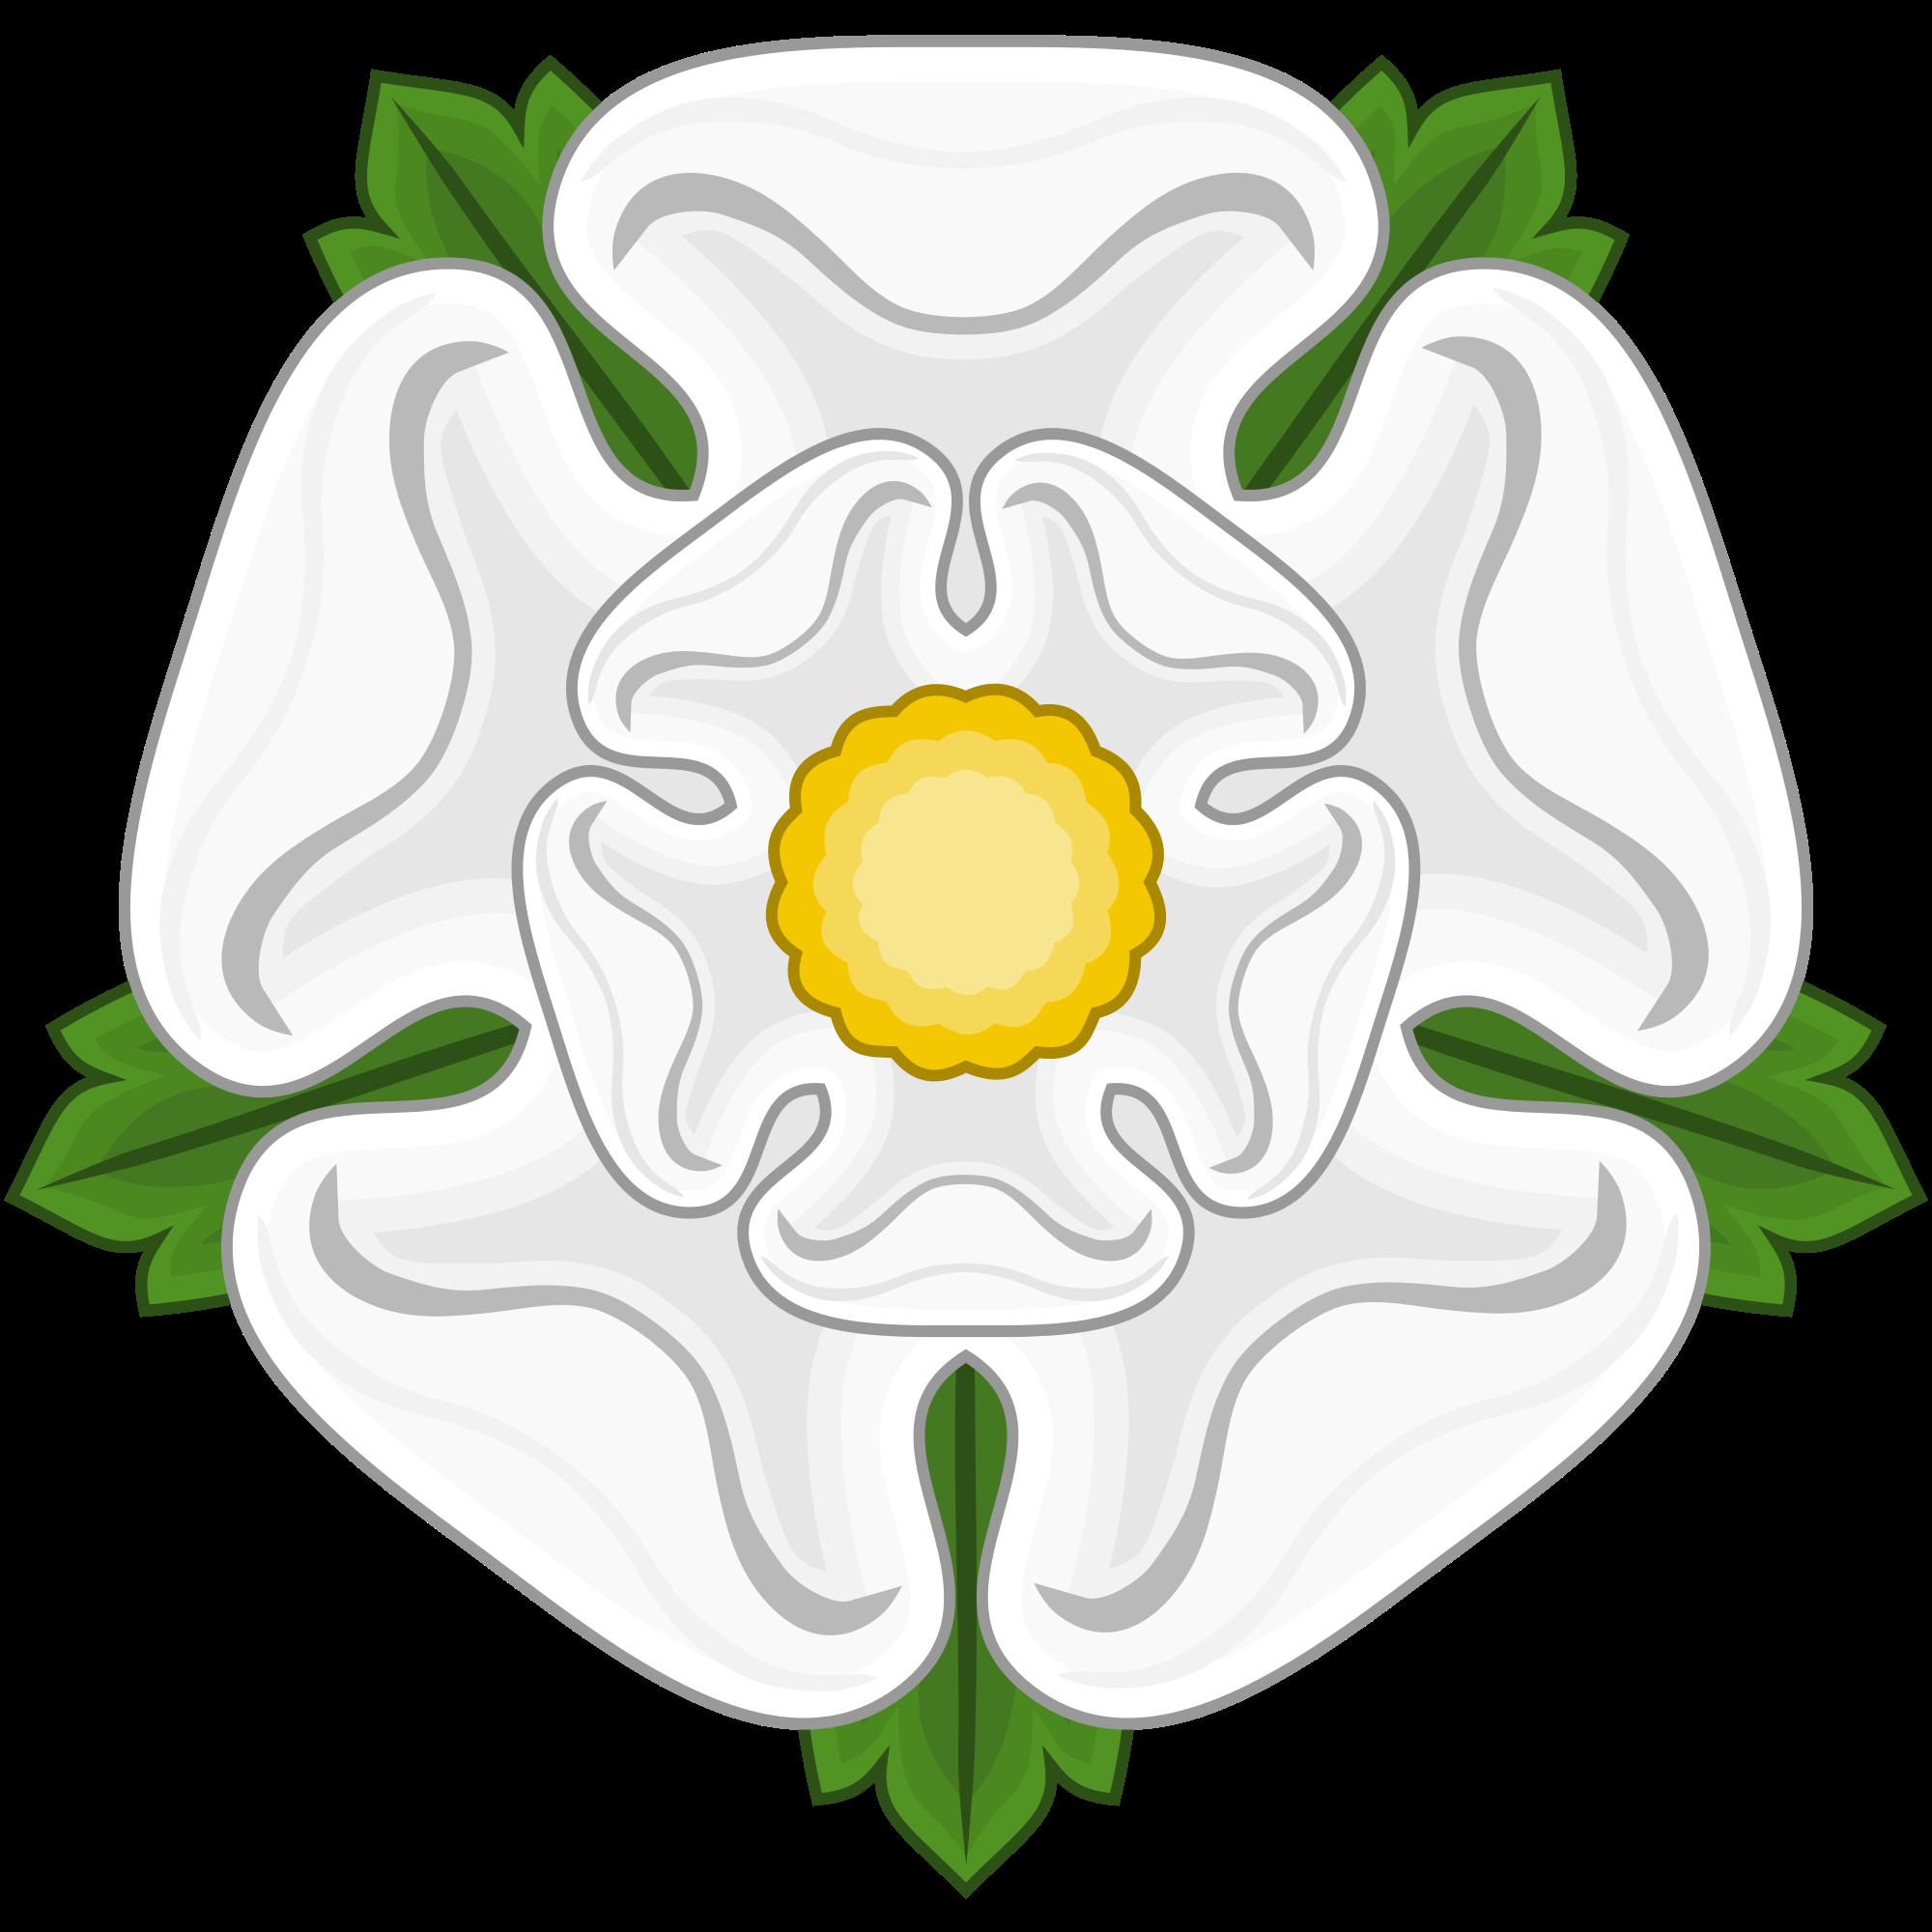 White Rose clipart graphic Rose white White Clipart Rose